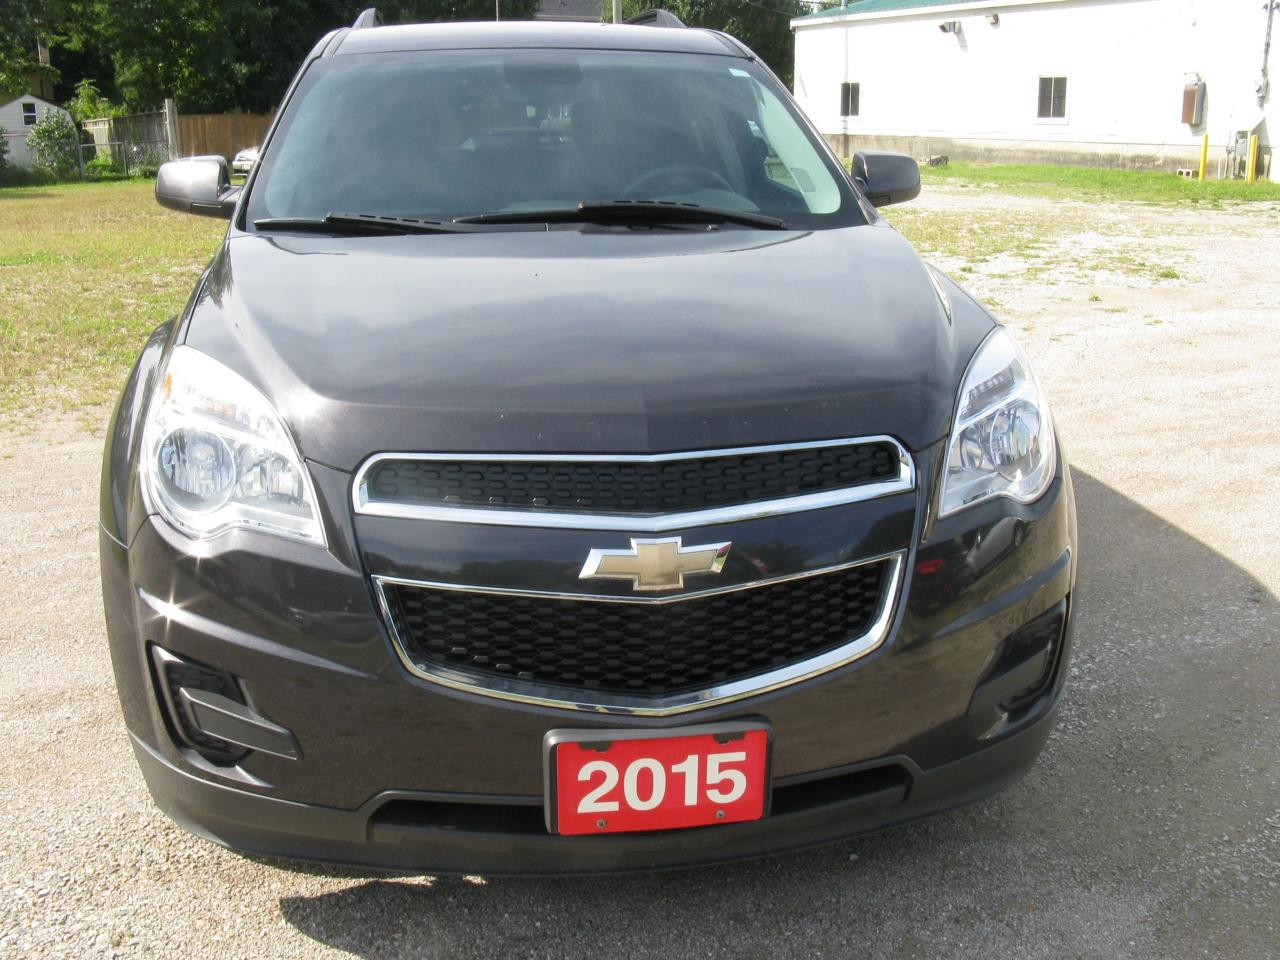 2015 Chevrolet Equinox cloth